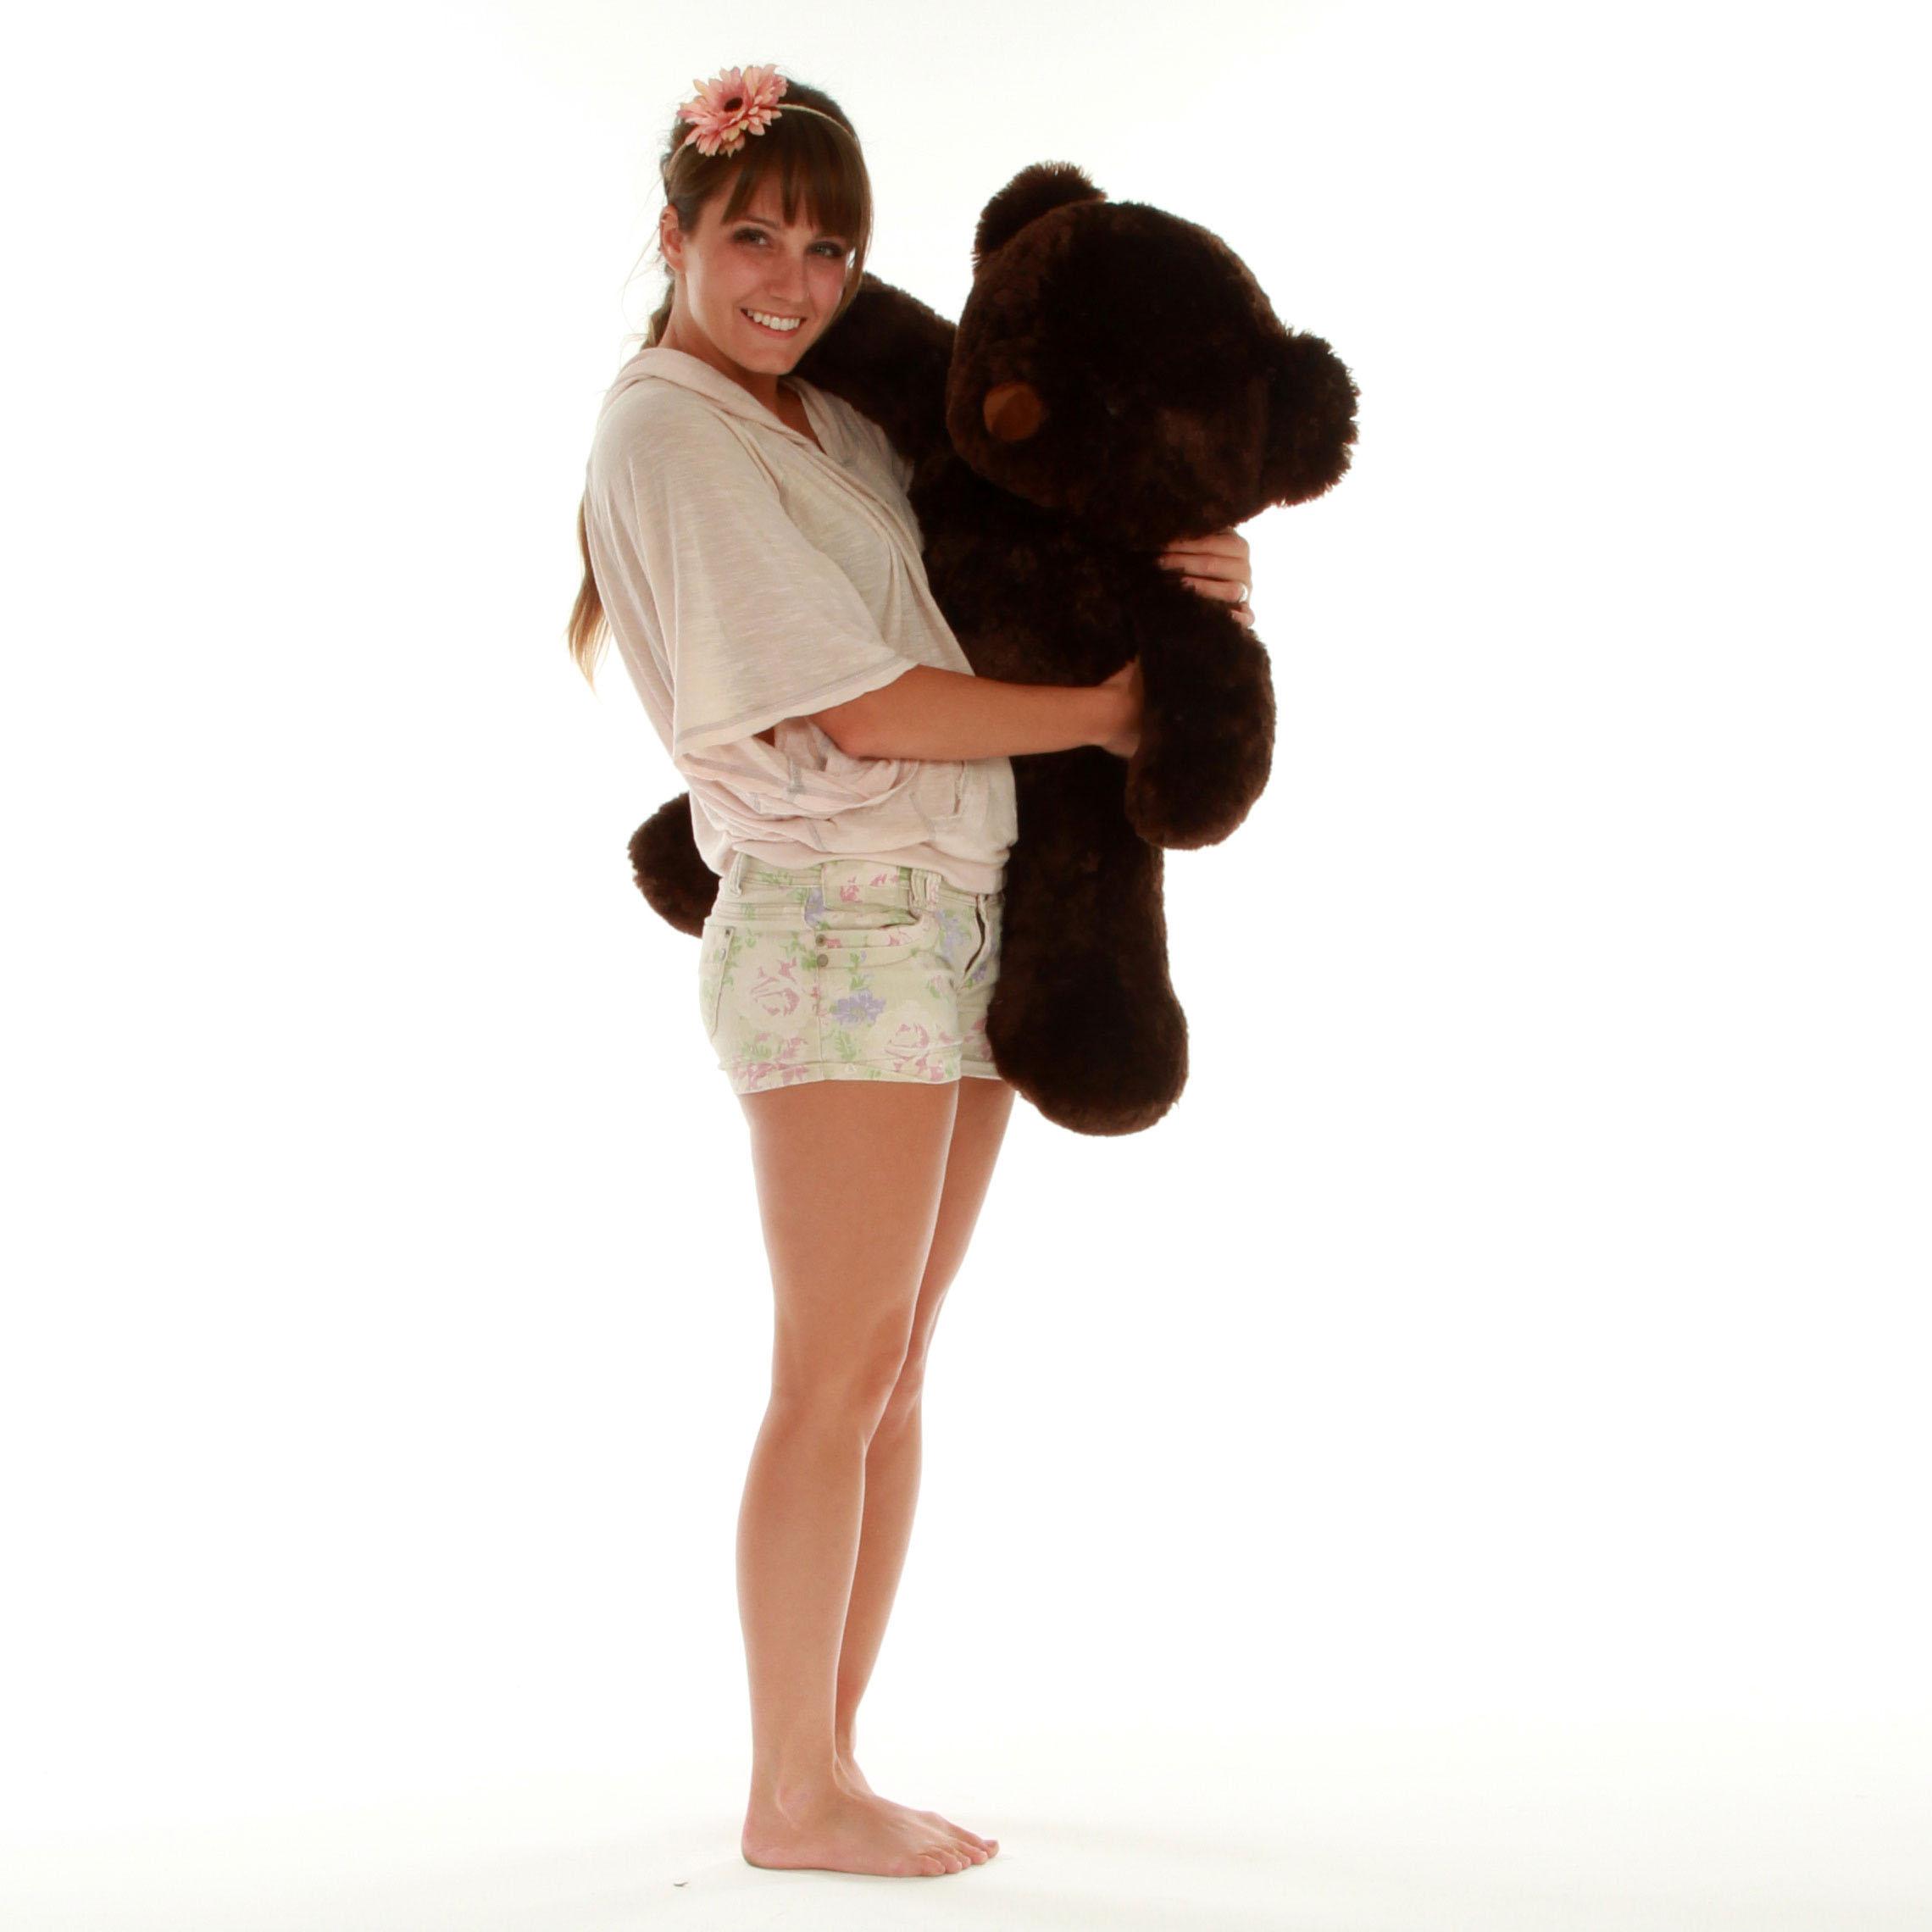 30in-munchkin-chubs-dark-brown-teddy-bear-r.jpg